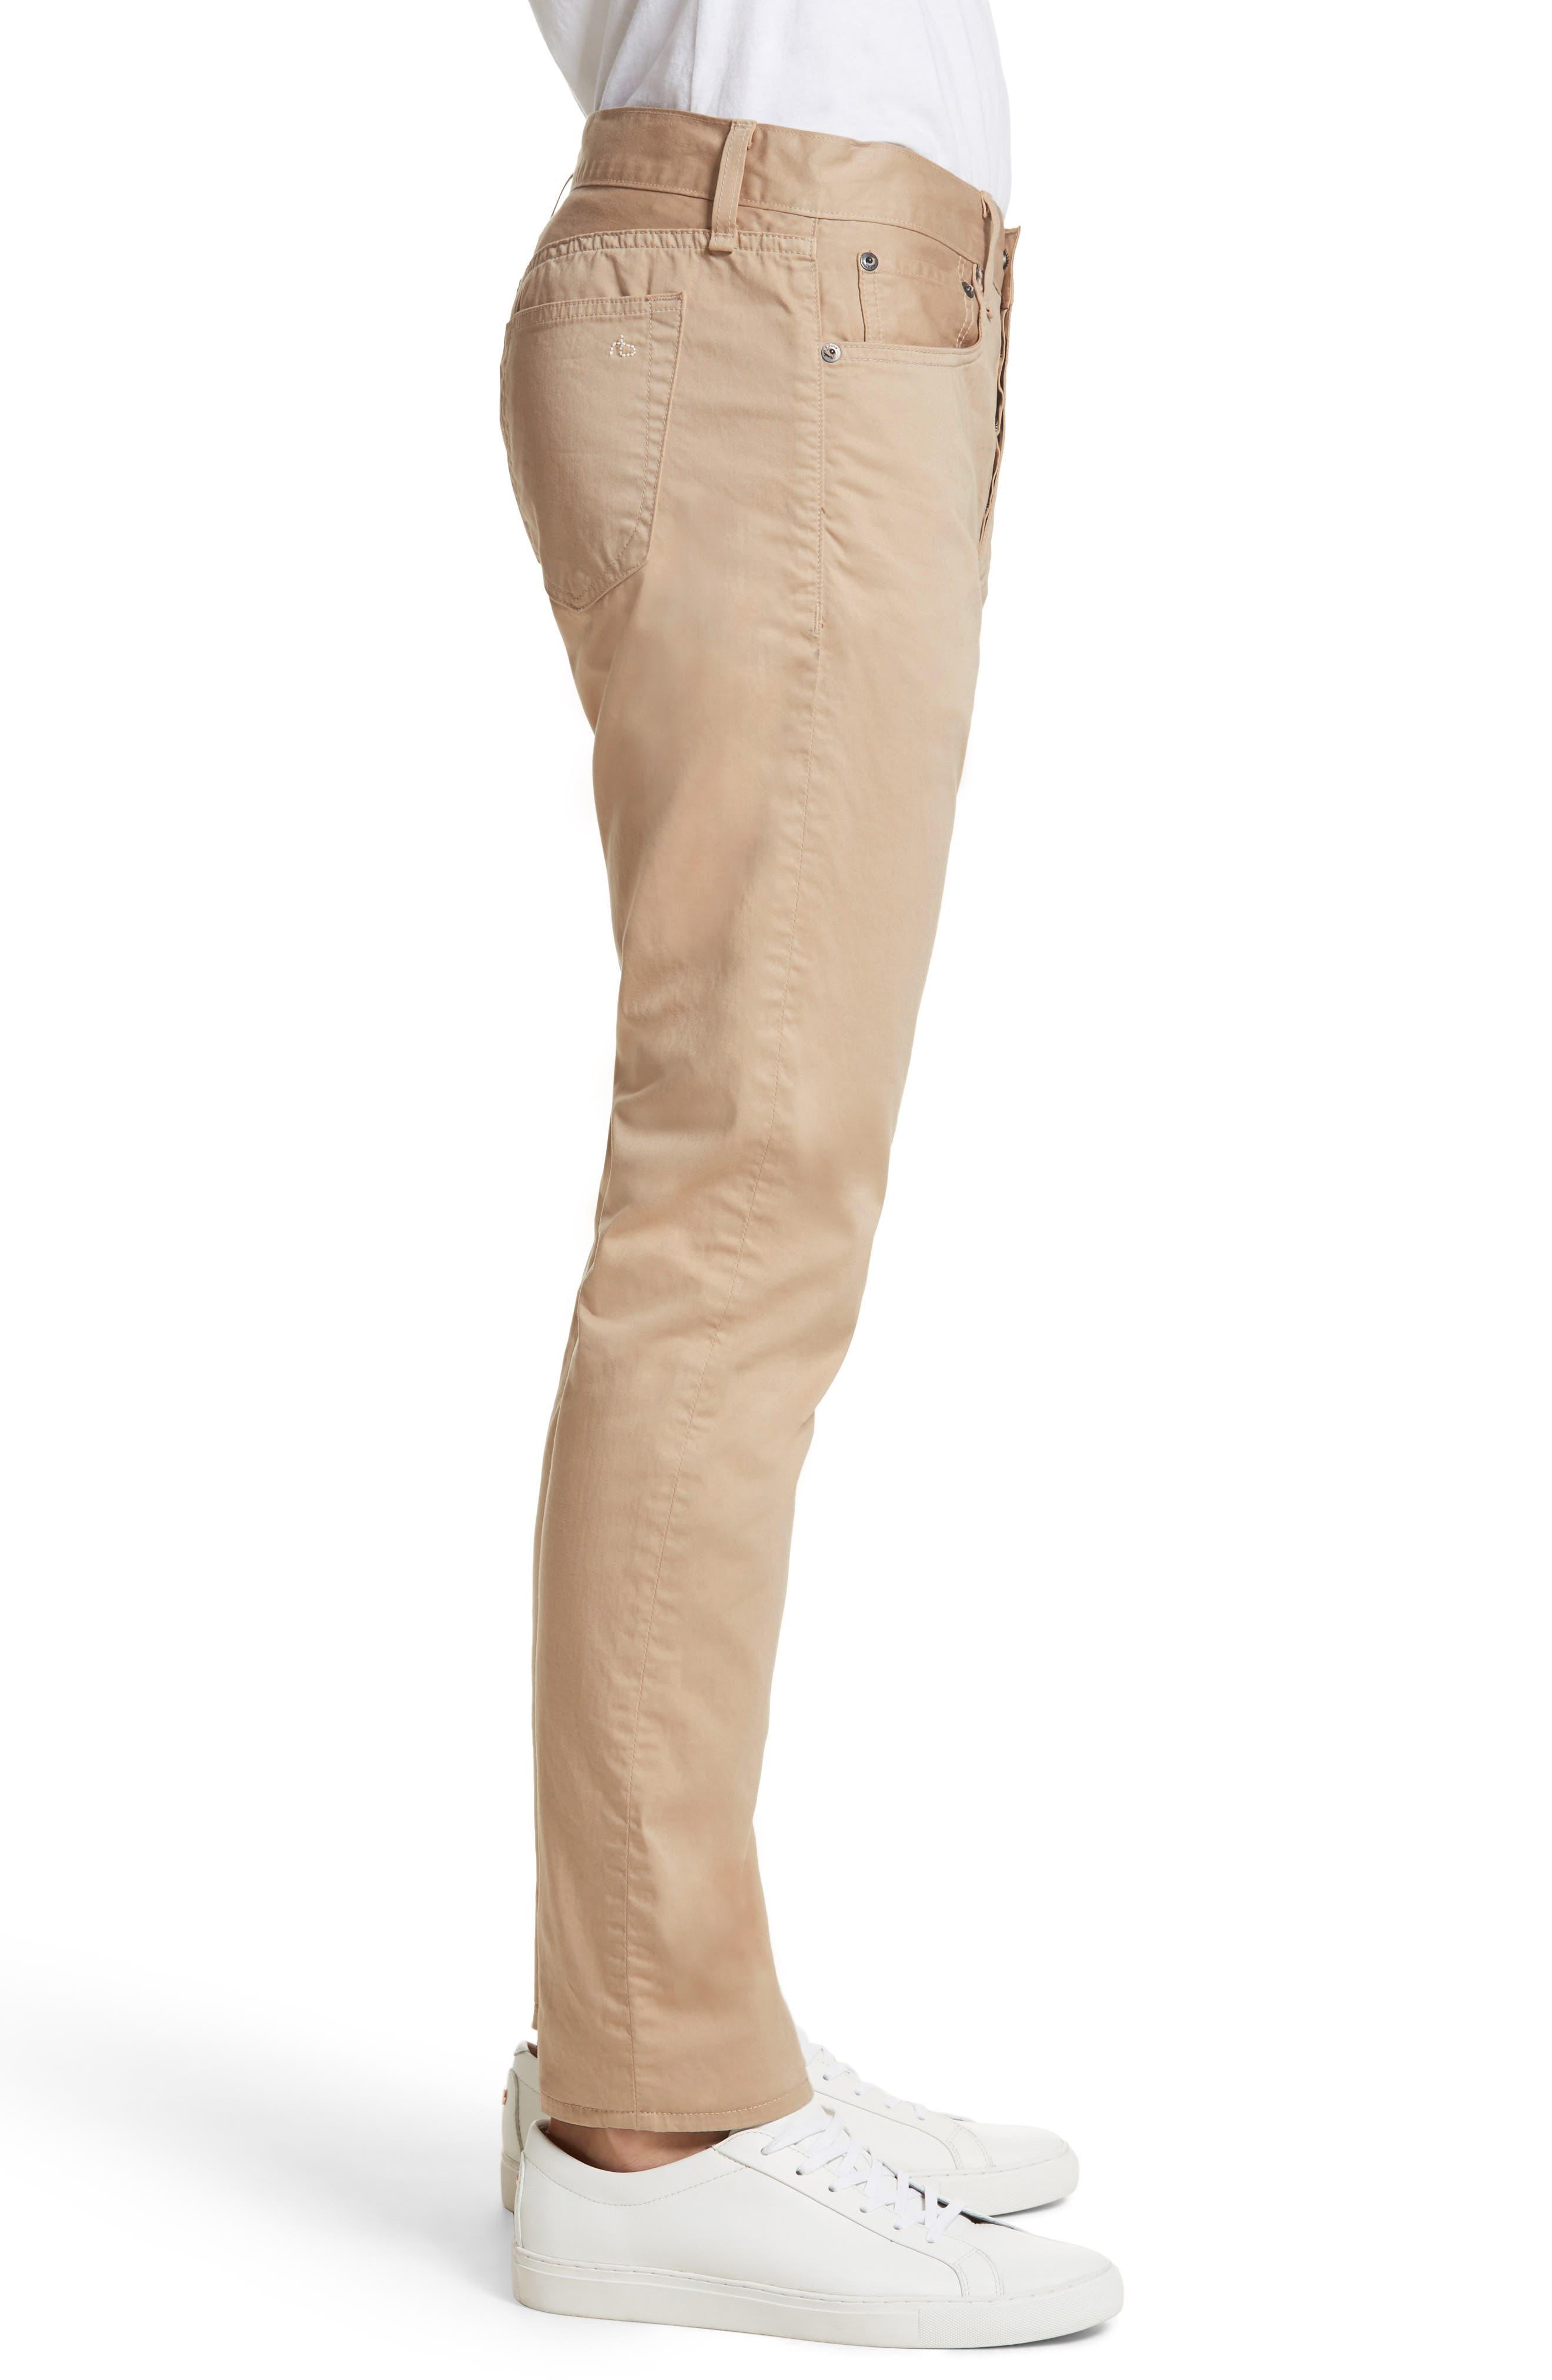 Fit 2 Five-Pocket Twill Pants,                             Alternate thumbnail 3, color,                             250